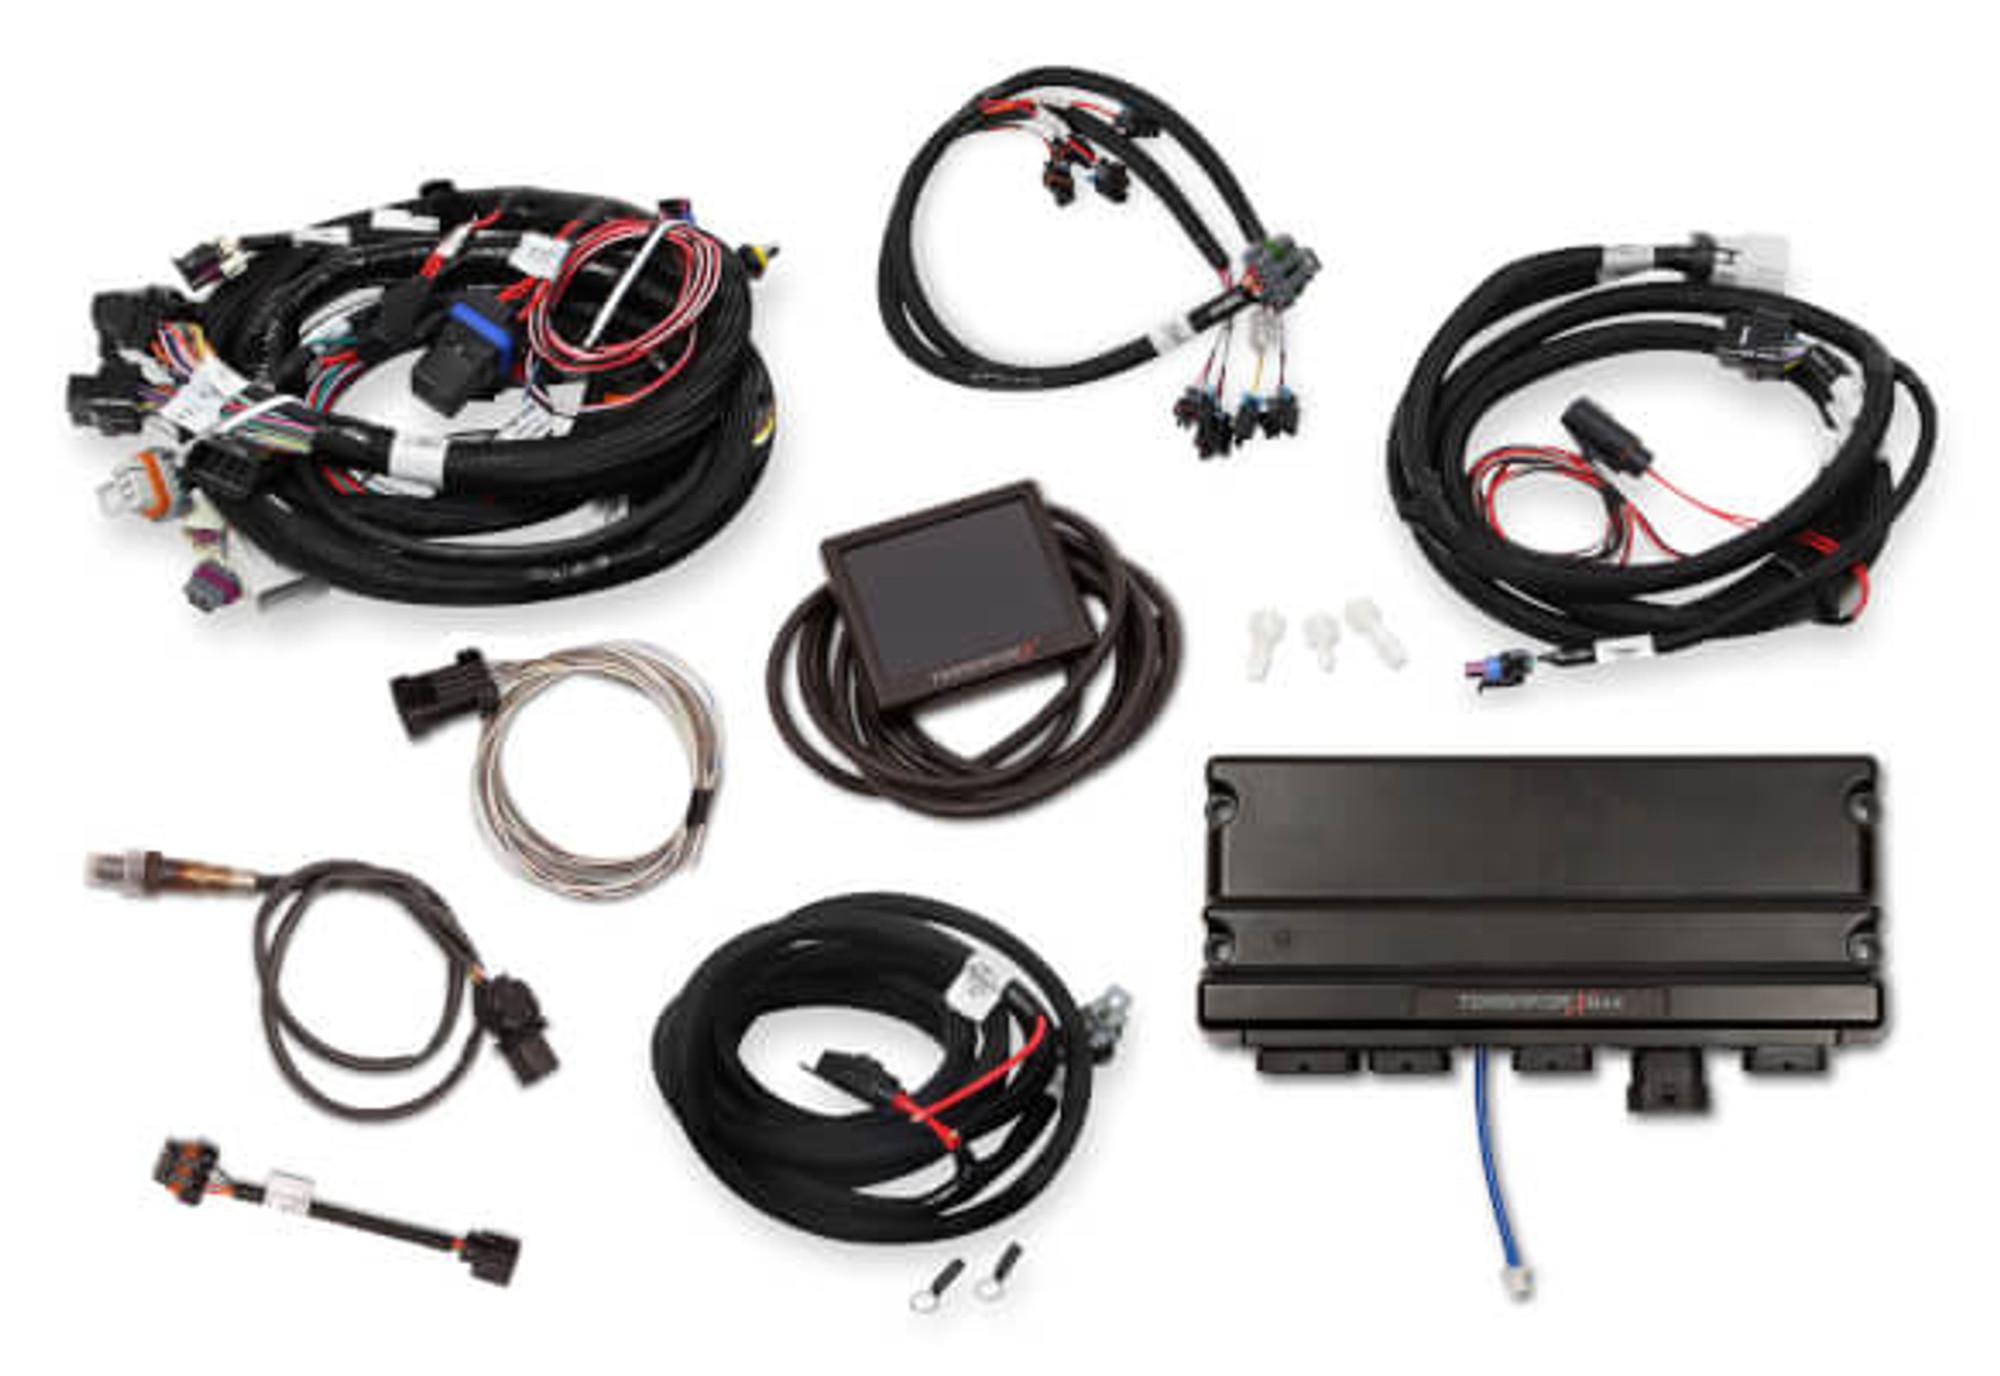 Holley EFI Terminator X MAX LS1 24X/1X MPFI Kit with Transmission  Controller #550-916